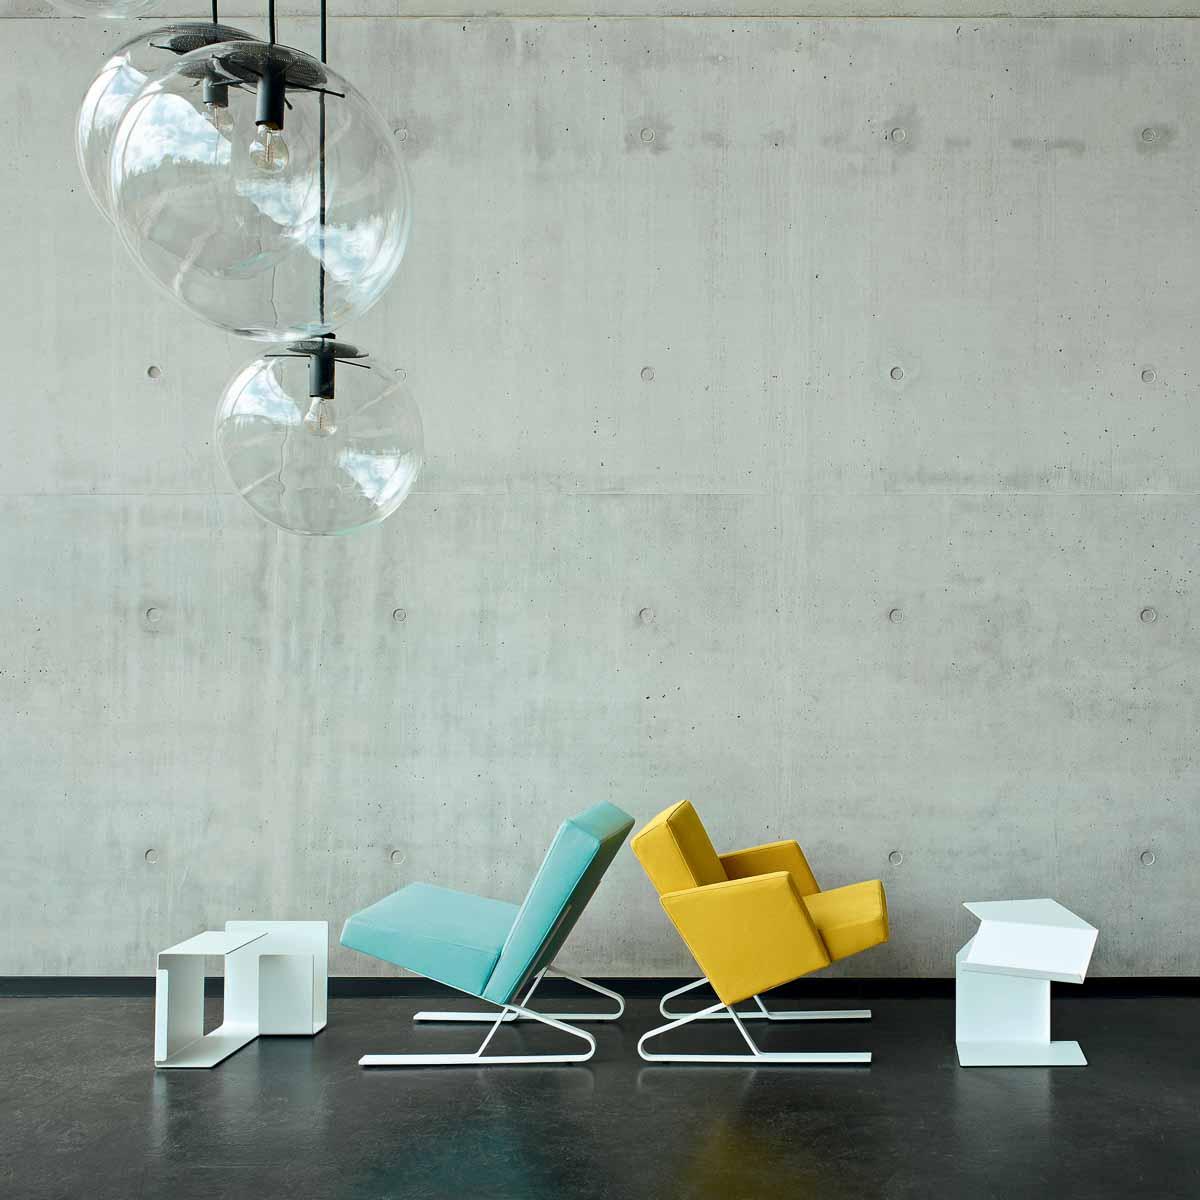 Foruse Sessel Satyr von Classicon © Foto Mark Seleen